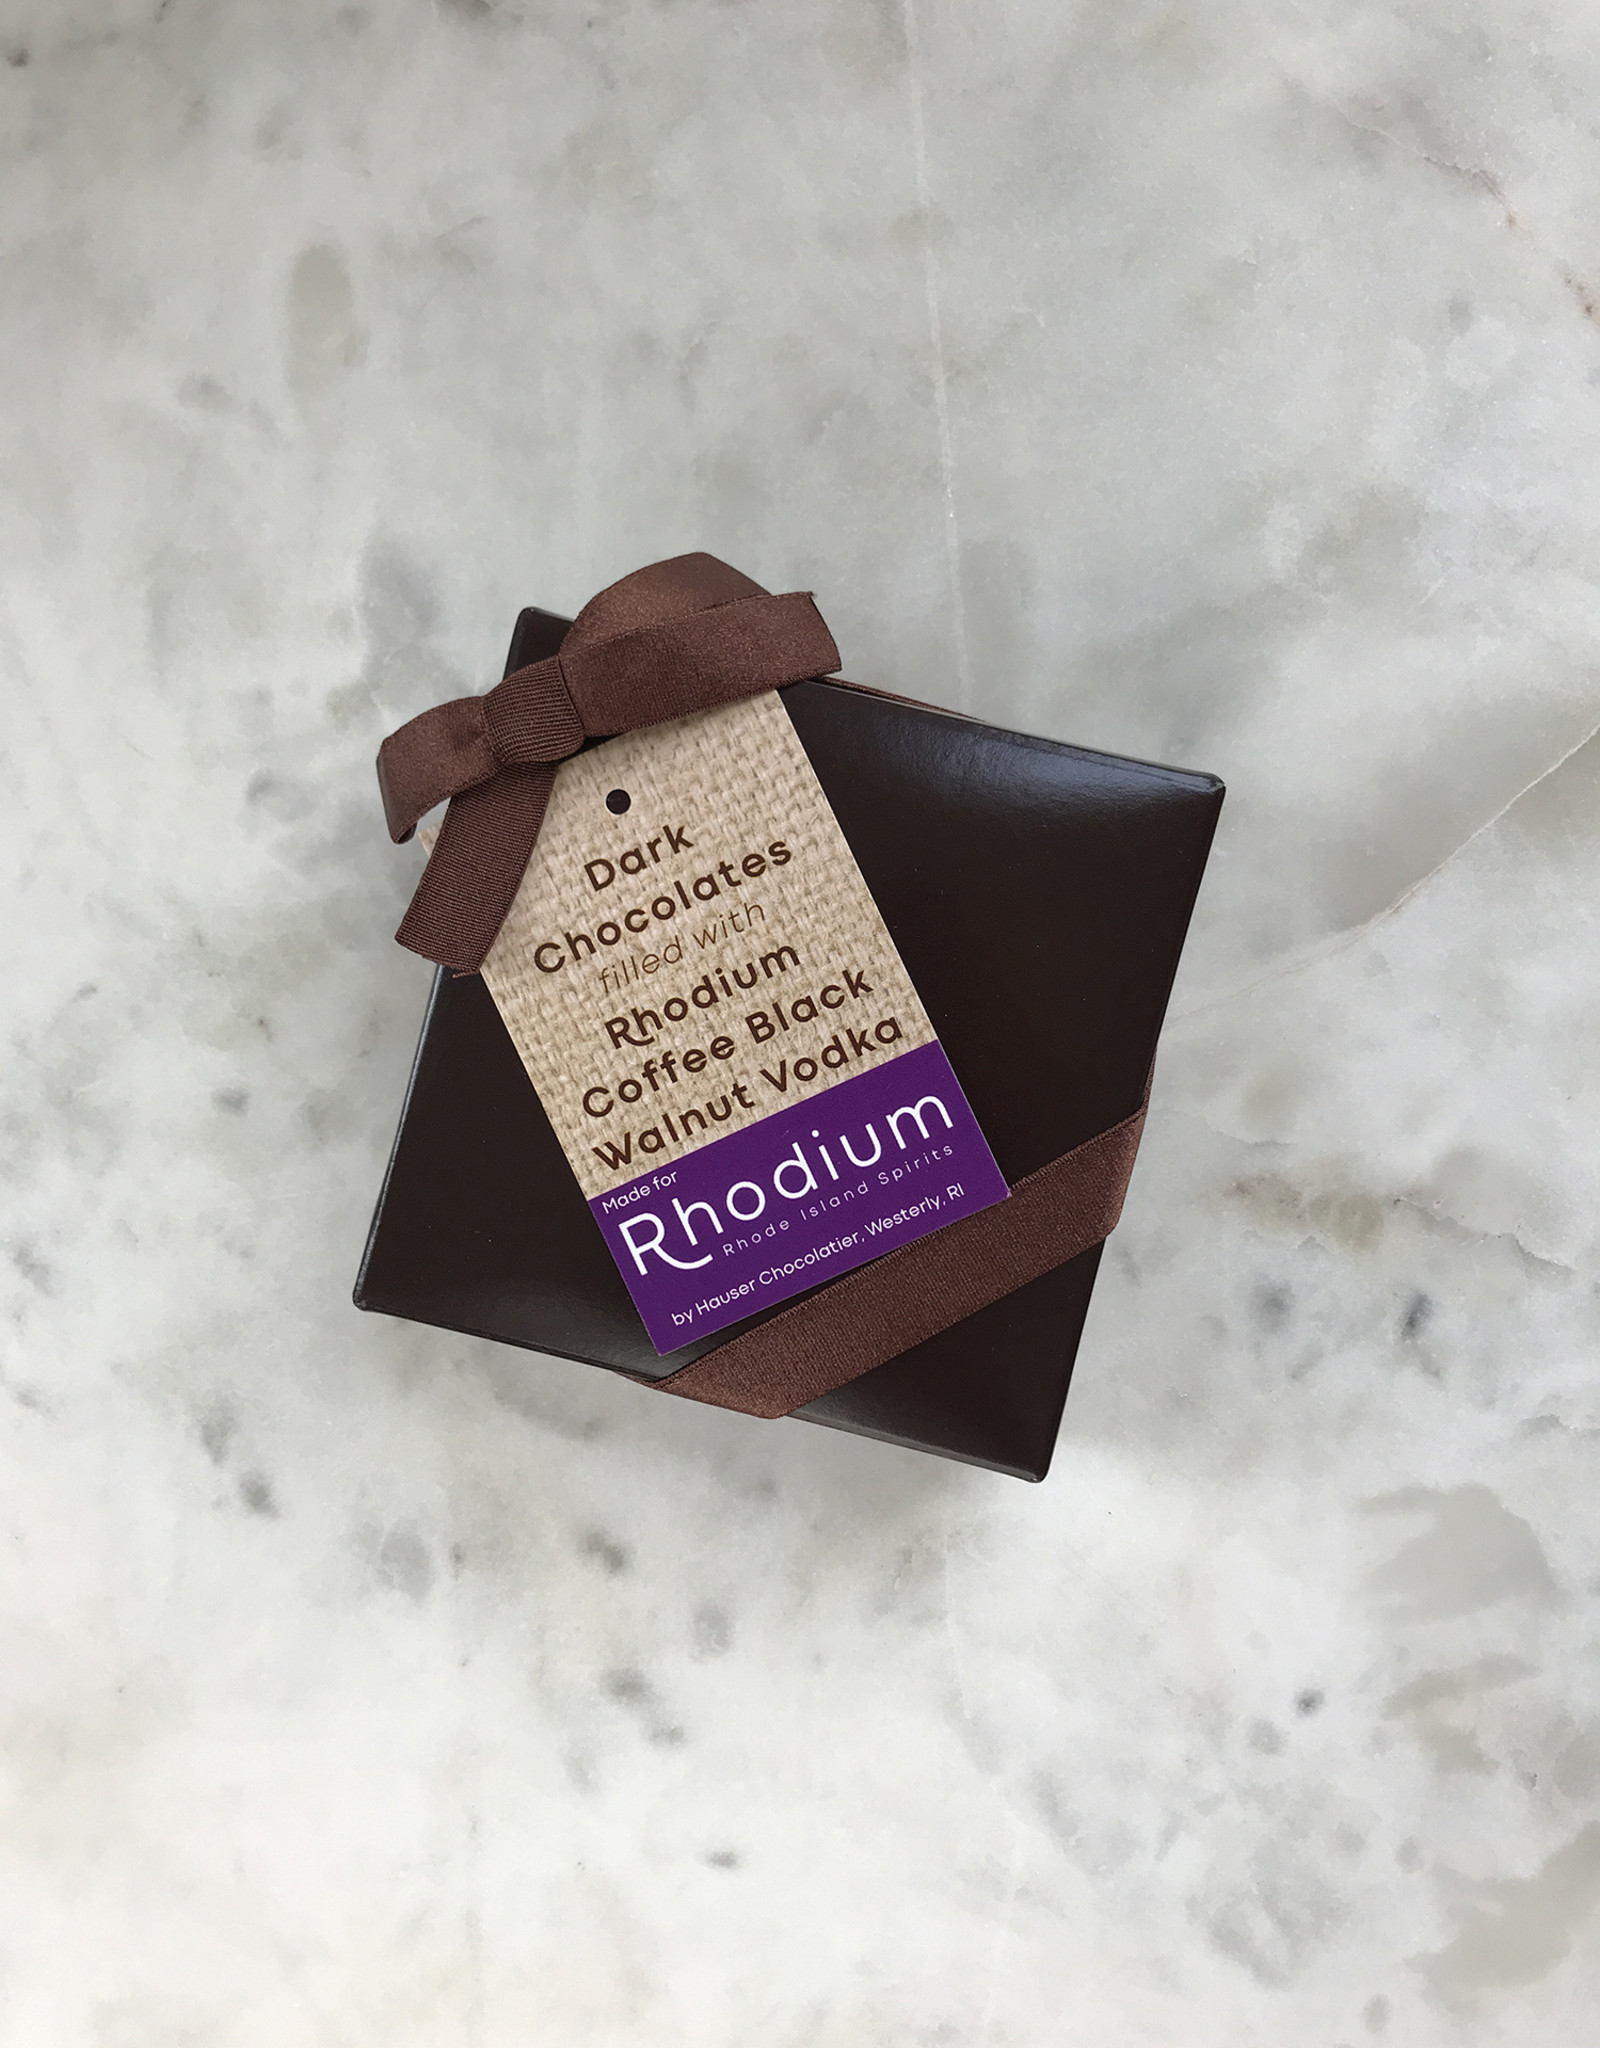 Rhodium Coffee Vodka Chocolate Truffles, Set of 4